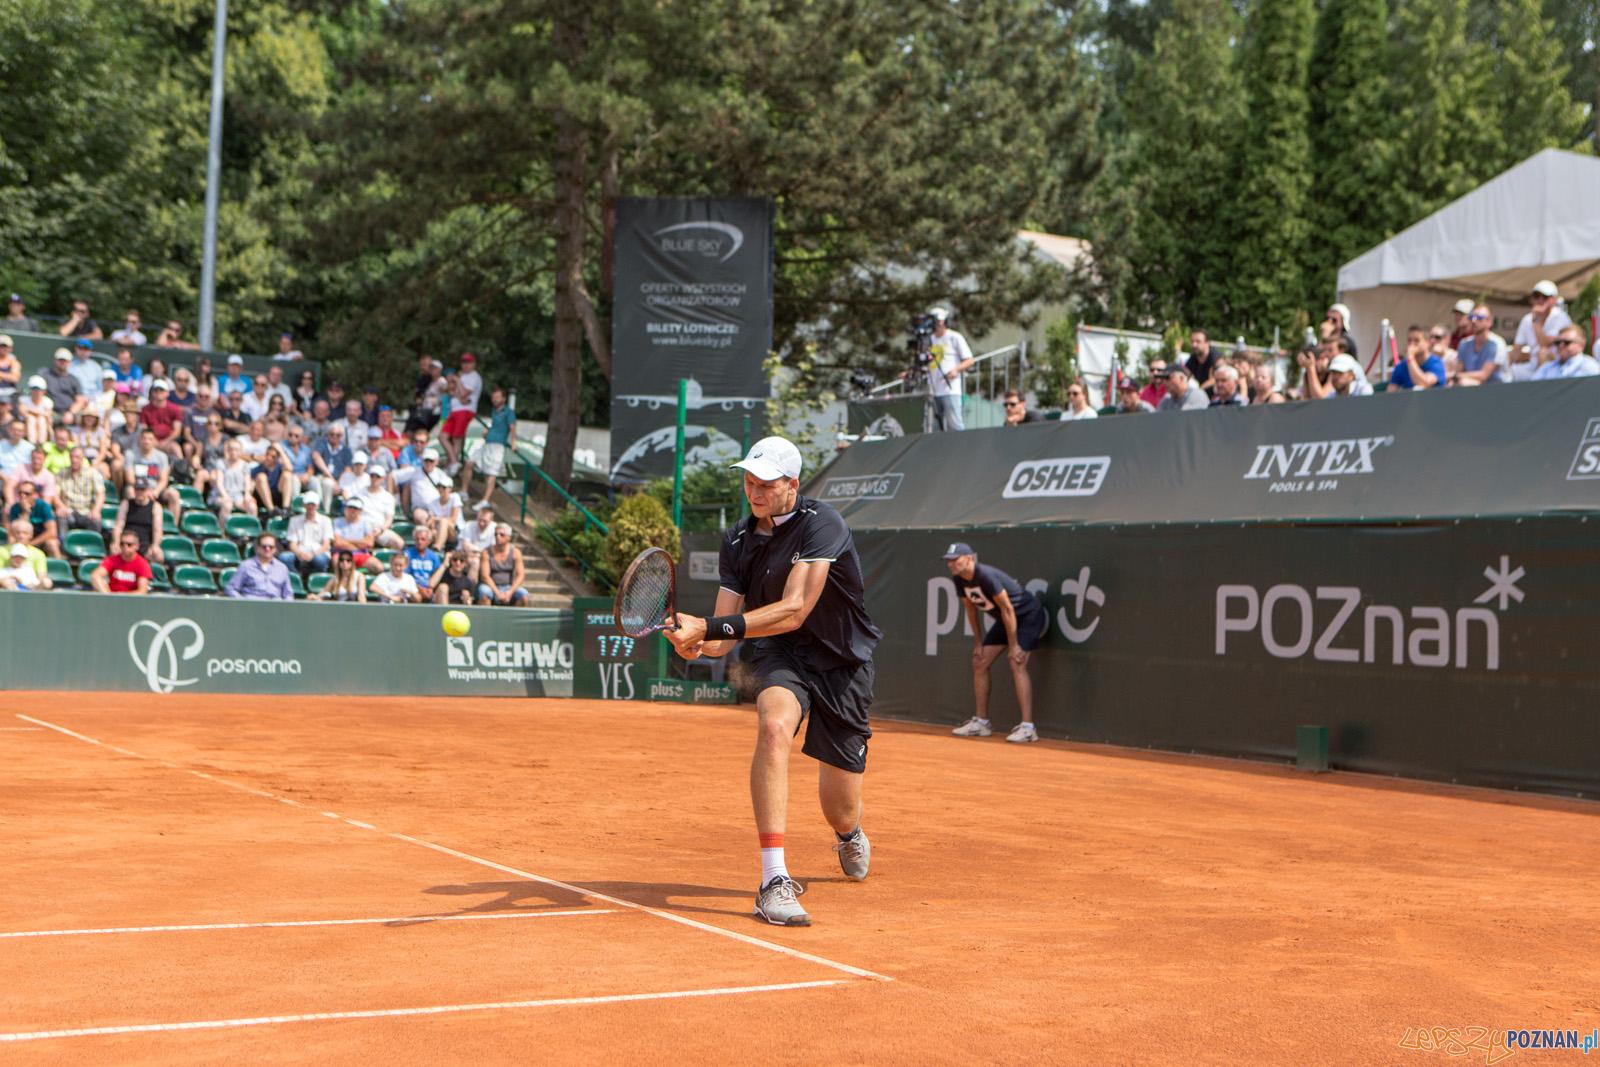 Allessandro Giannessi (ITA) vs Huber Hurkacz (POL) - Poznań Ope  Foto: Paweł Rychter